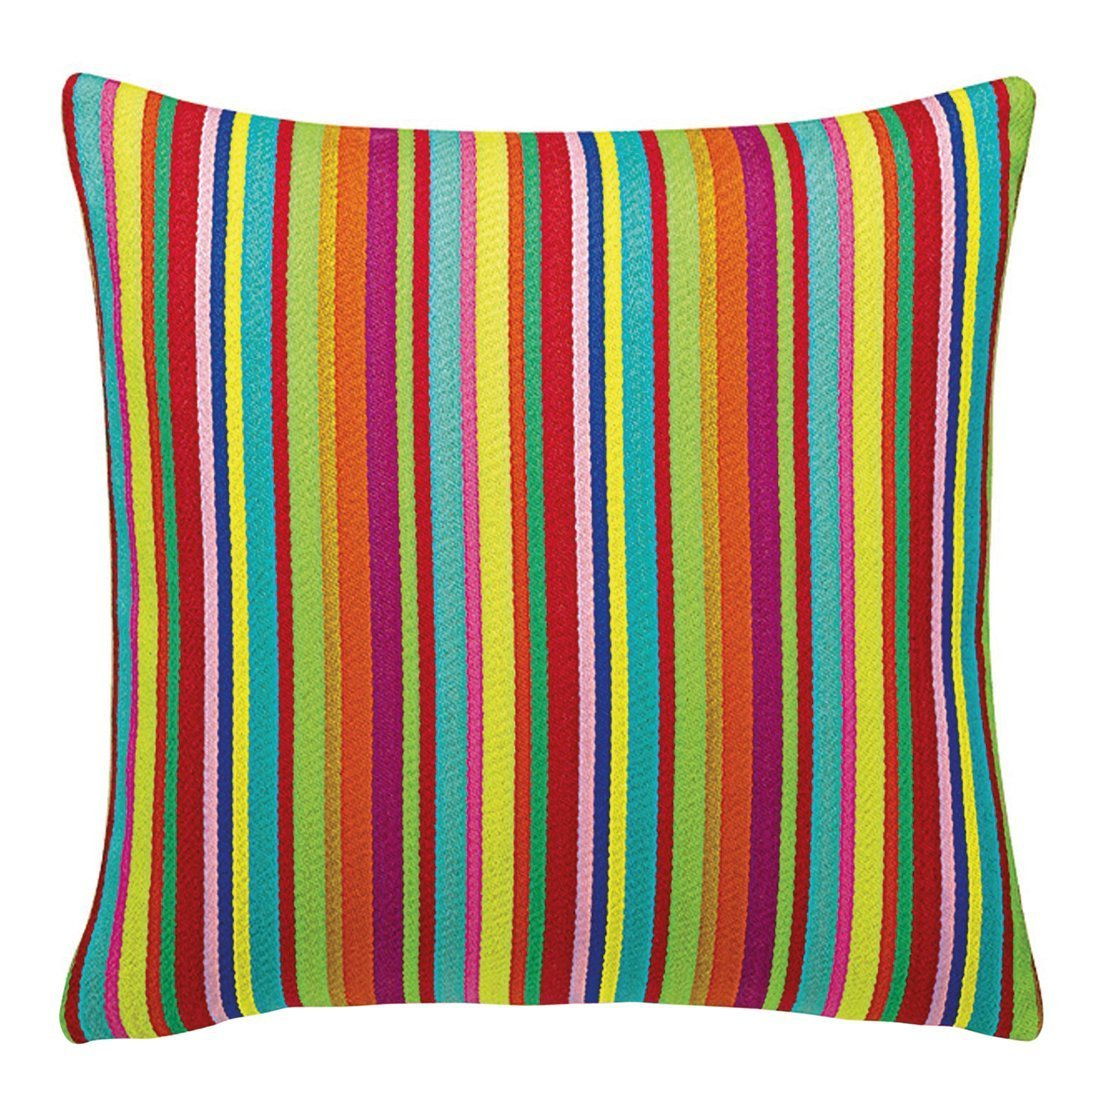 Vitra Maharam Millerstripe Multicolored Bright Kussen